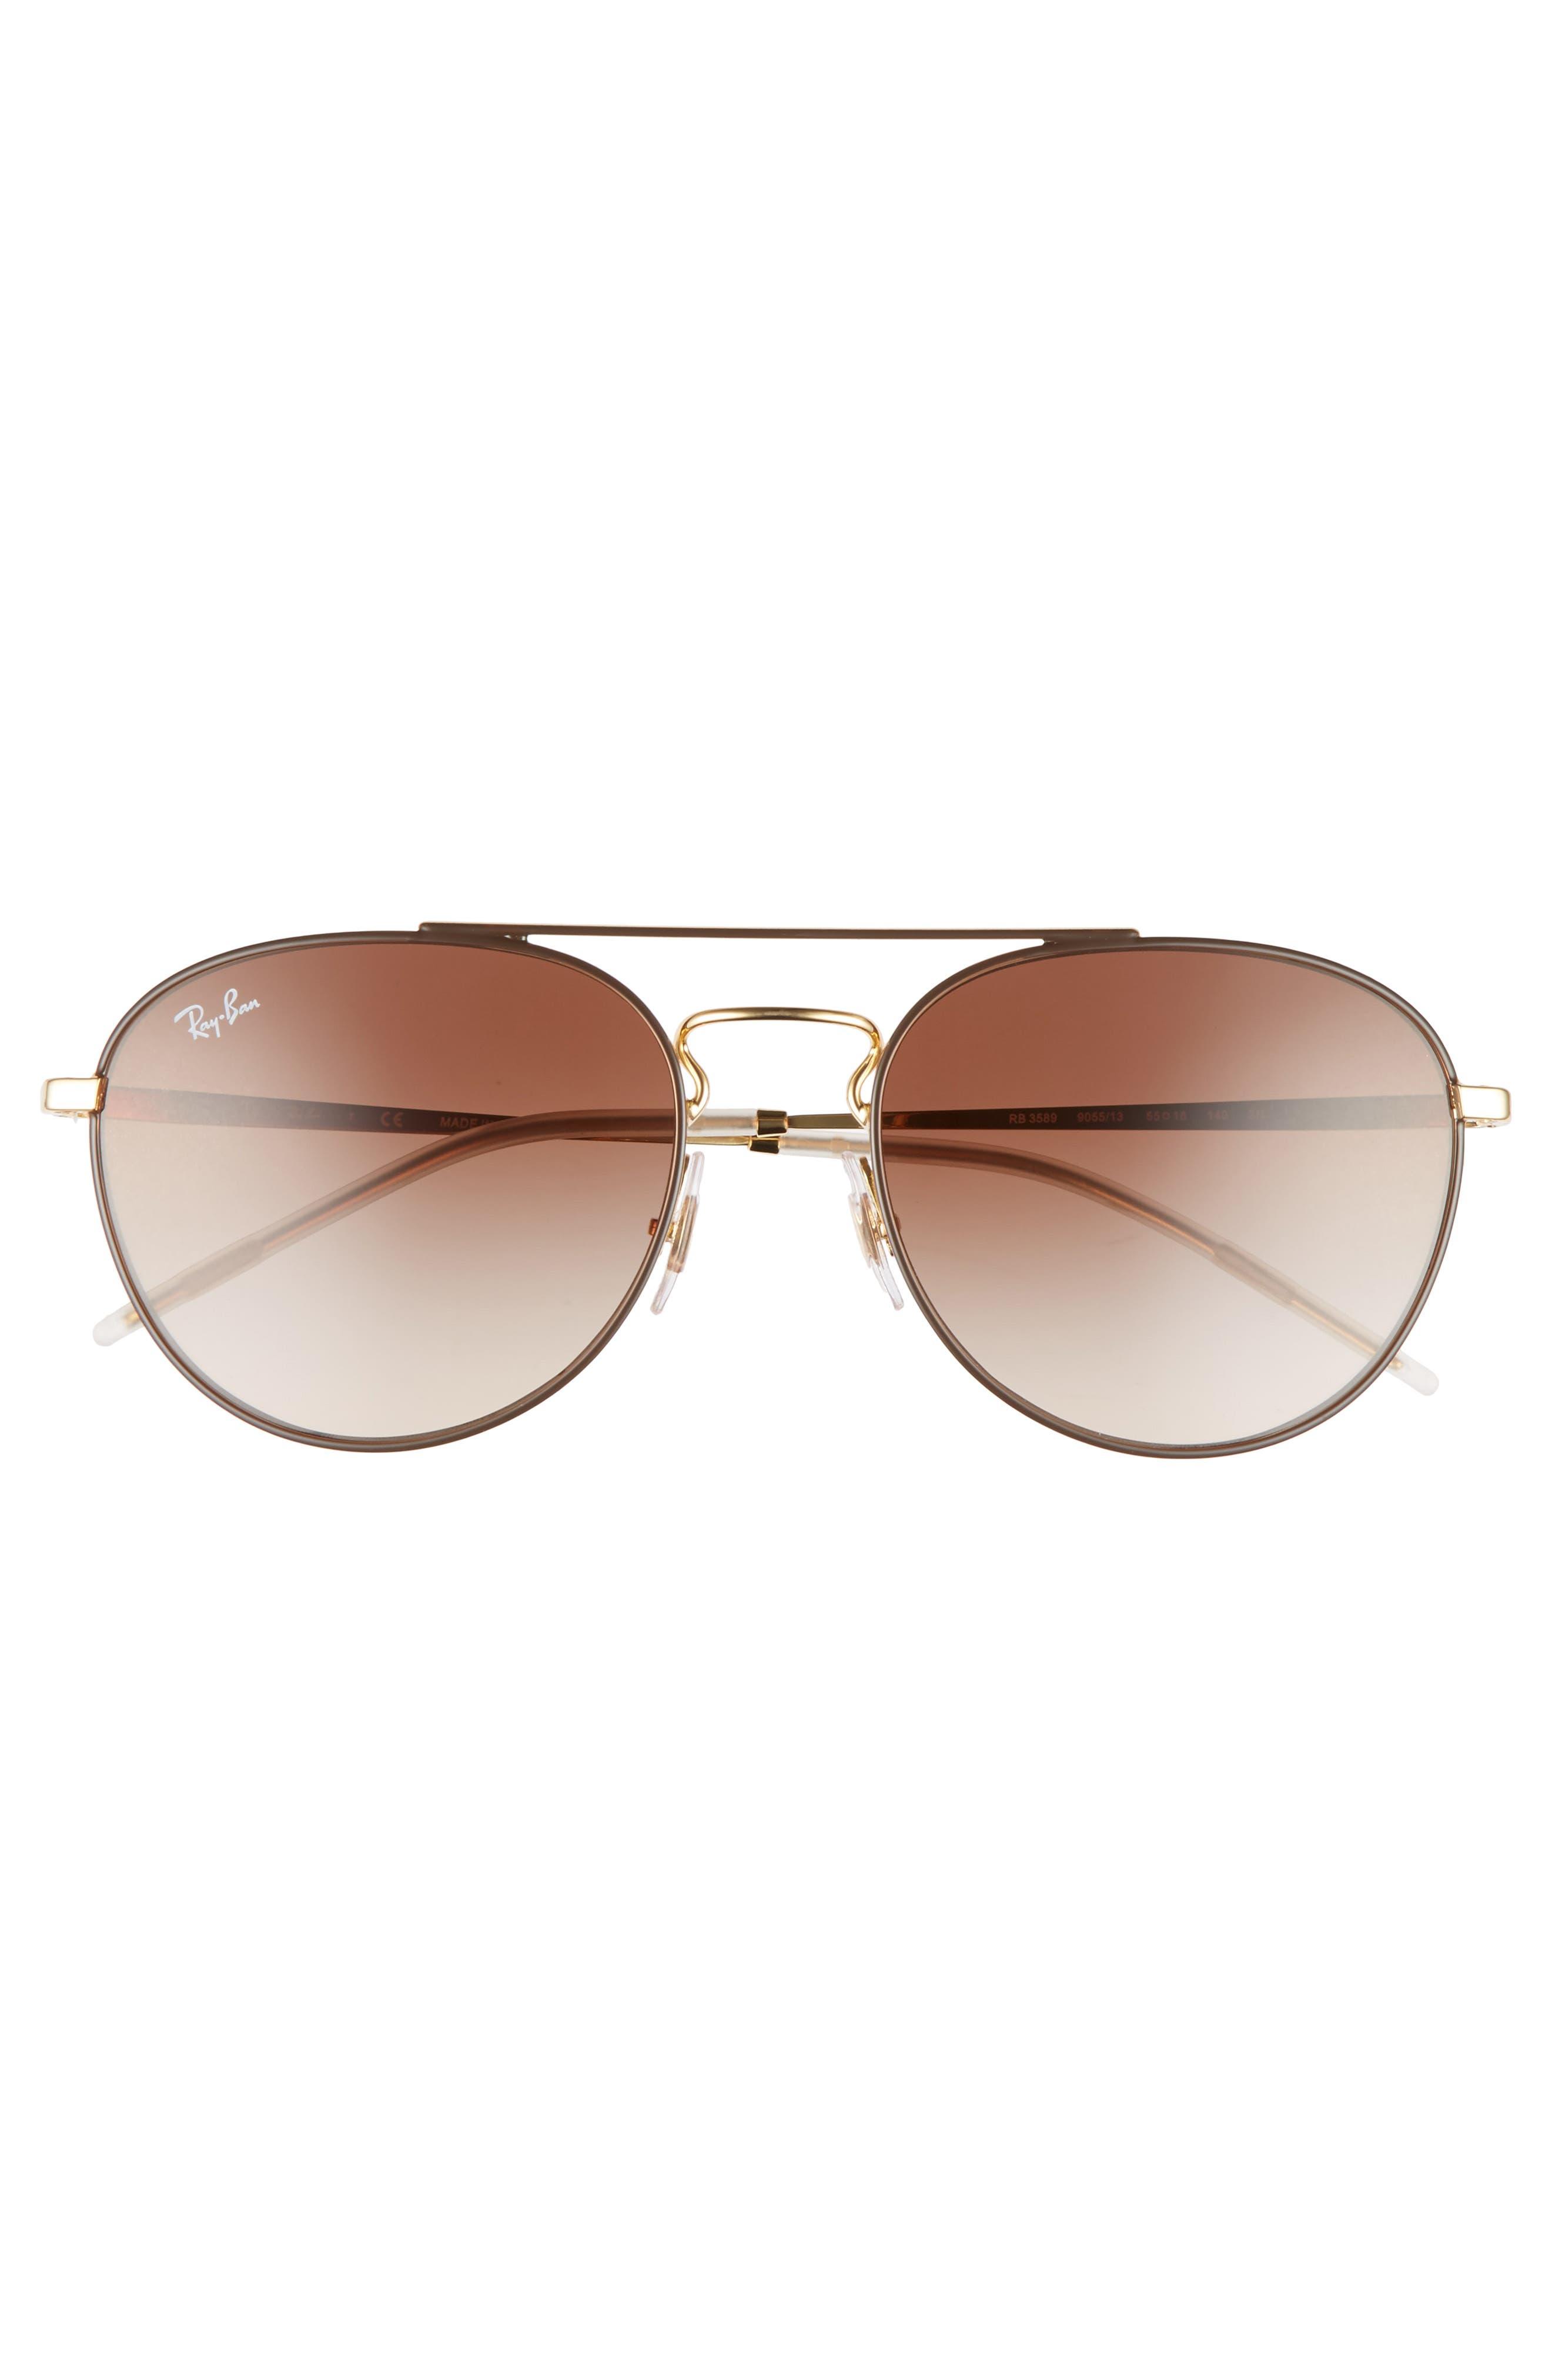 55mm Gradient Lens Round Aviator Sunglasses,                             Alternate thumbnail 11, color,